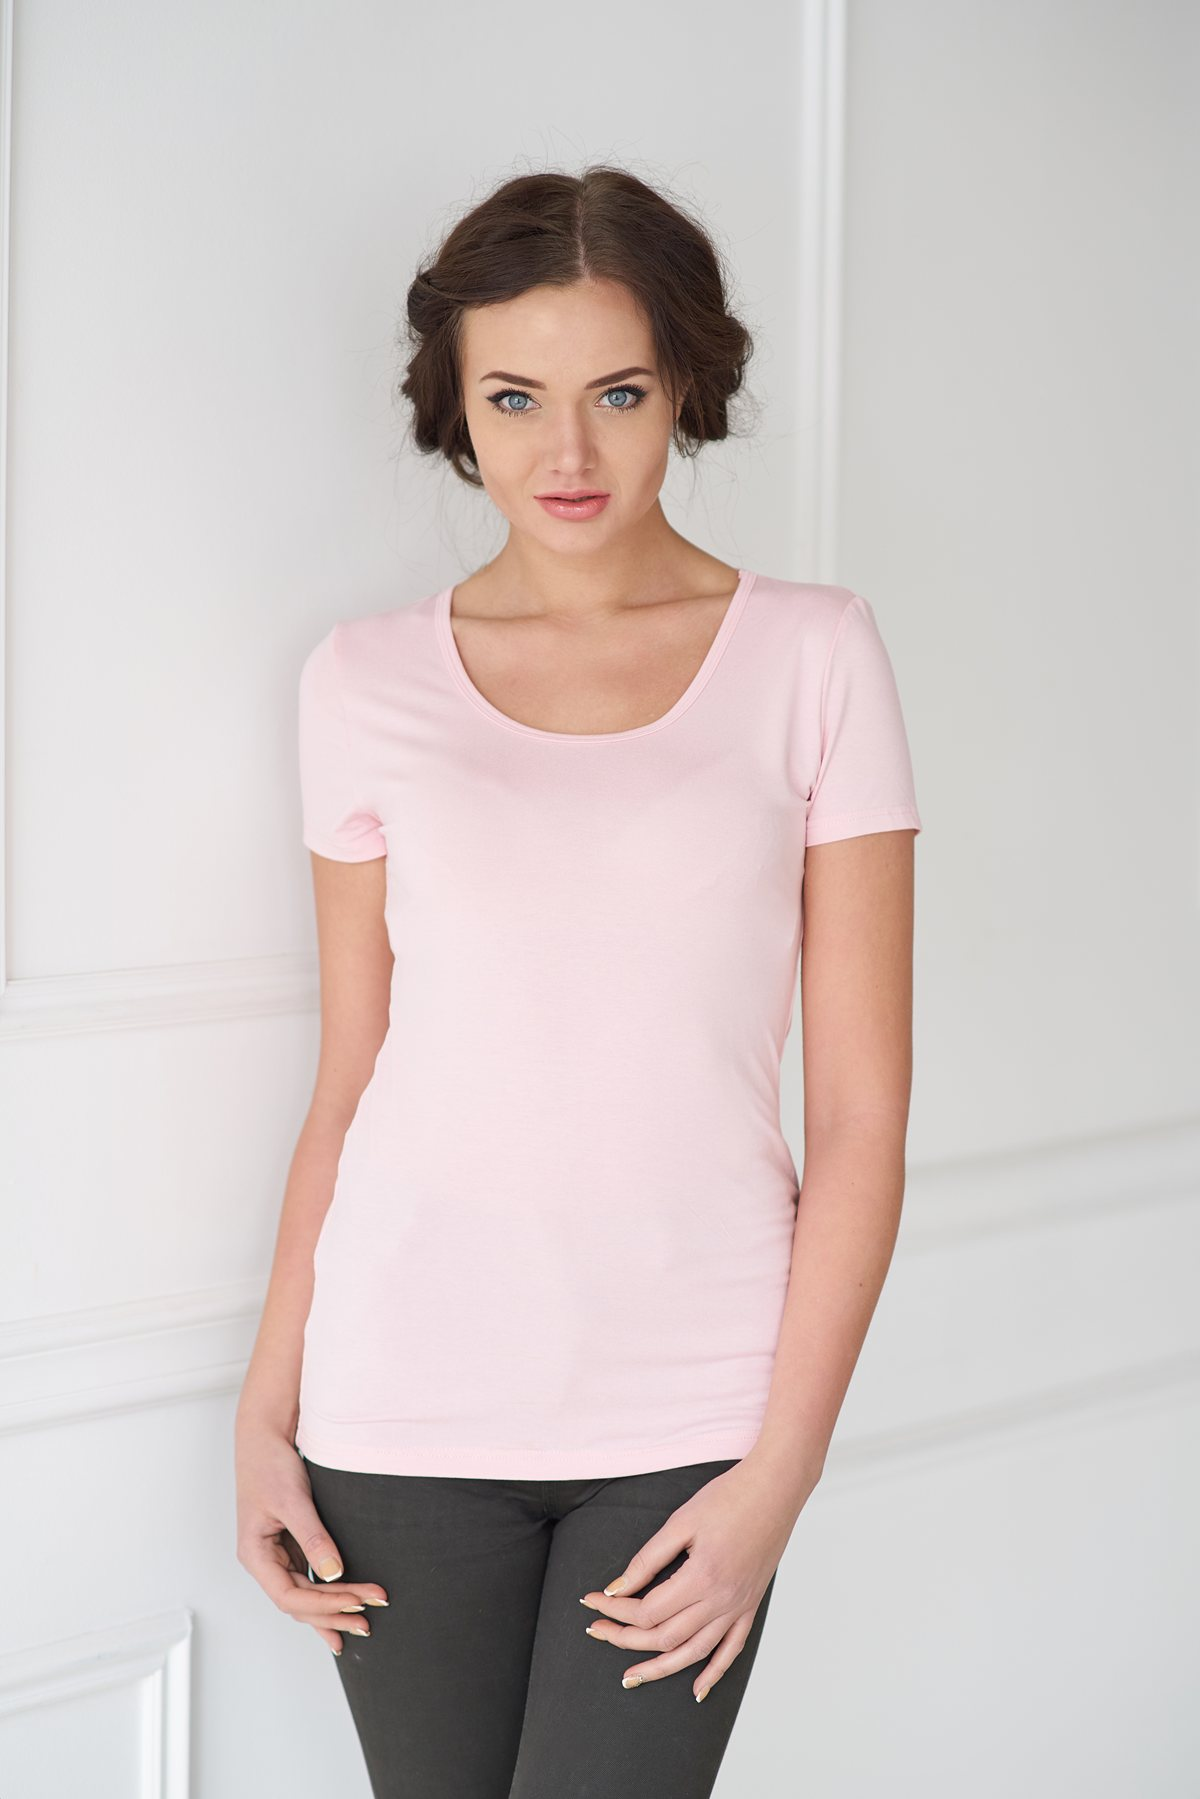 Жен. футболка арт. 19-0033 розовый р.